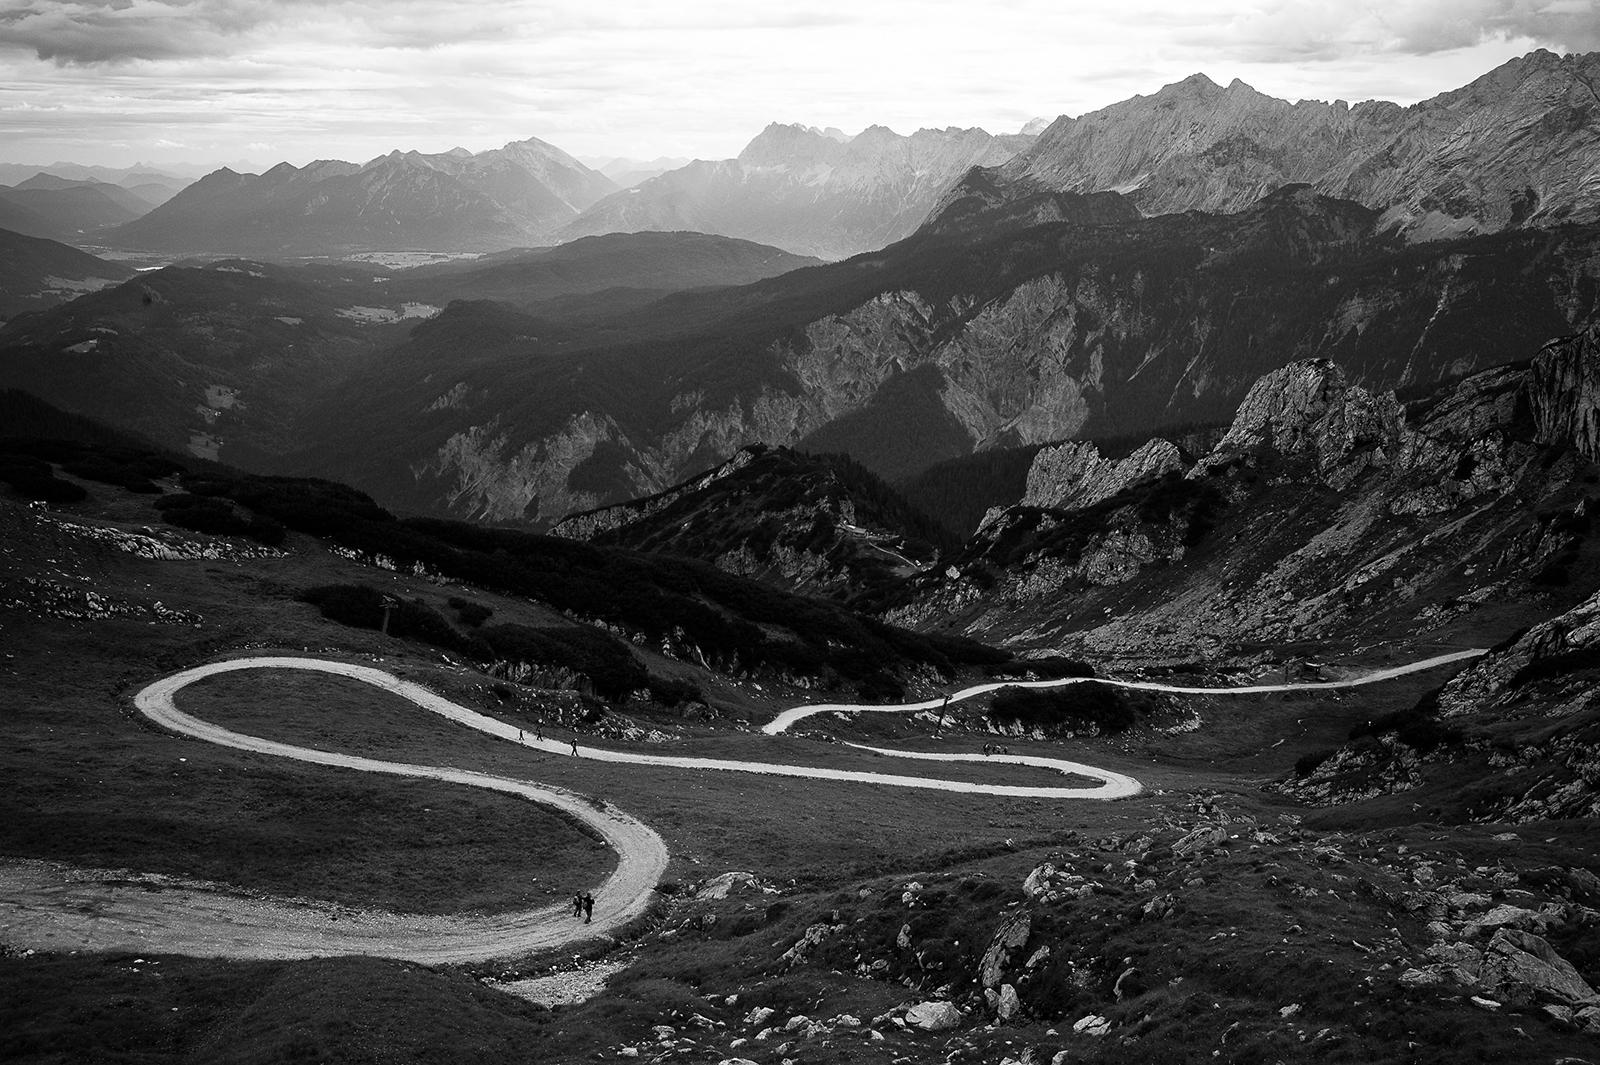 Alpspitz, Germany